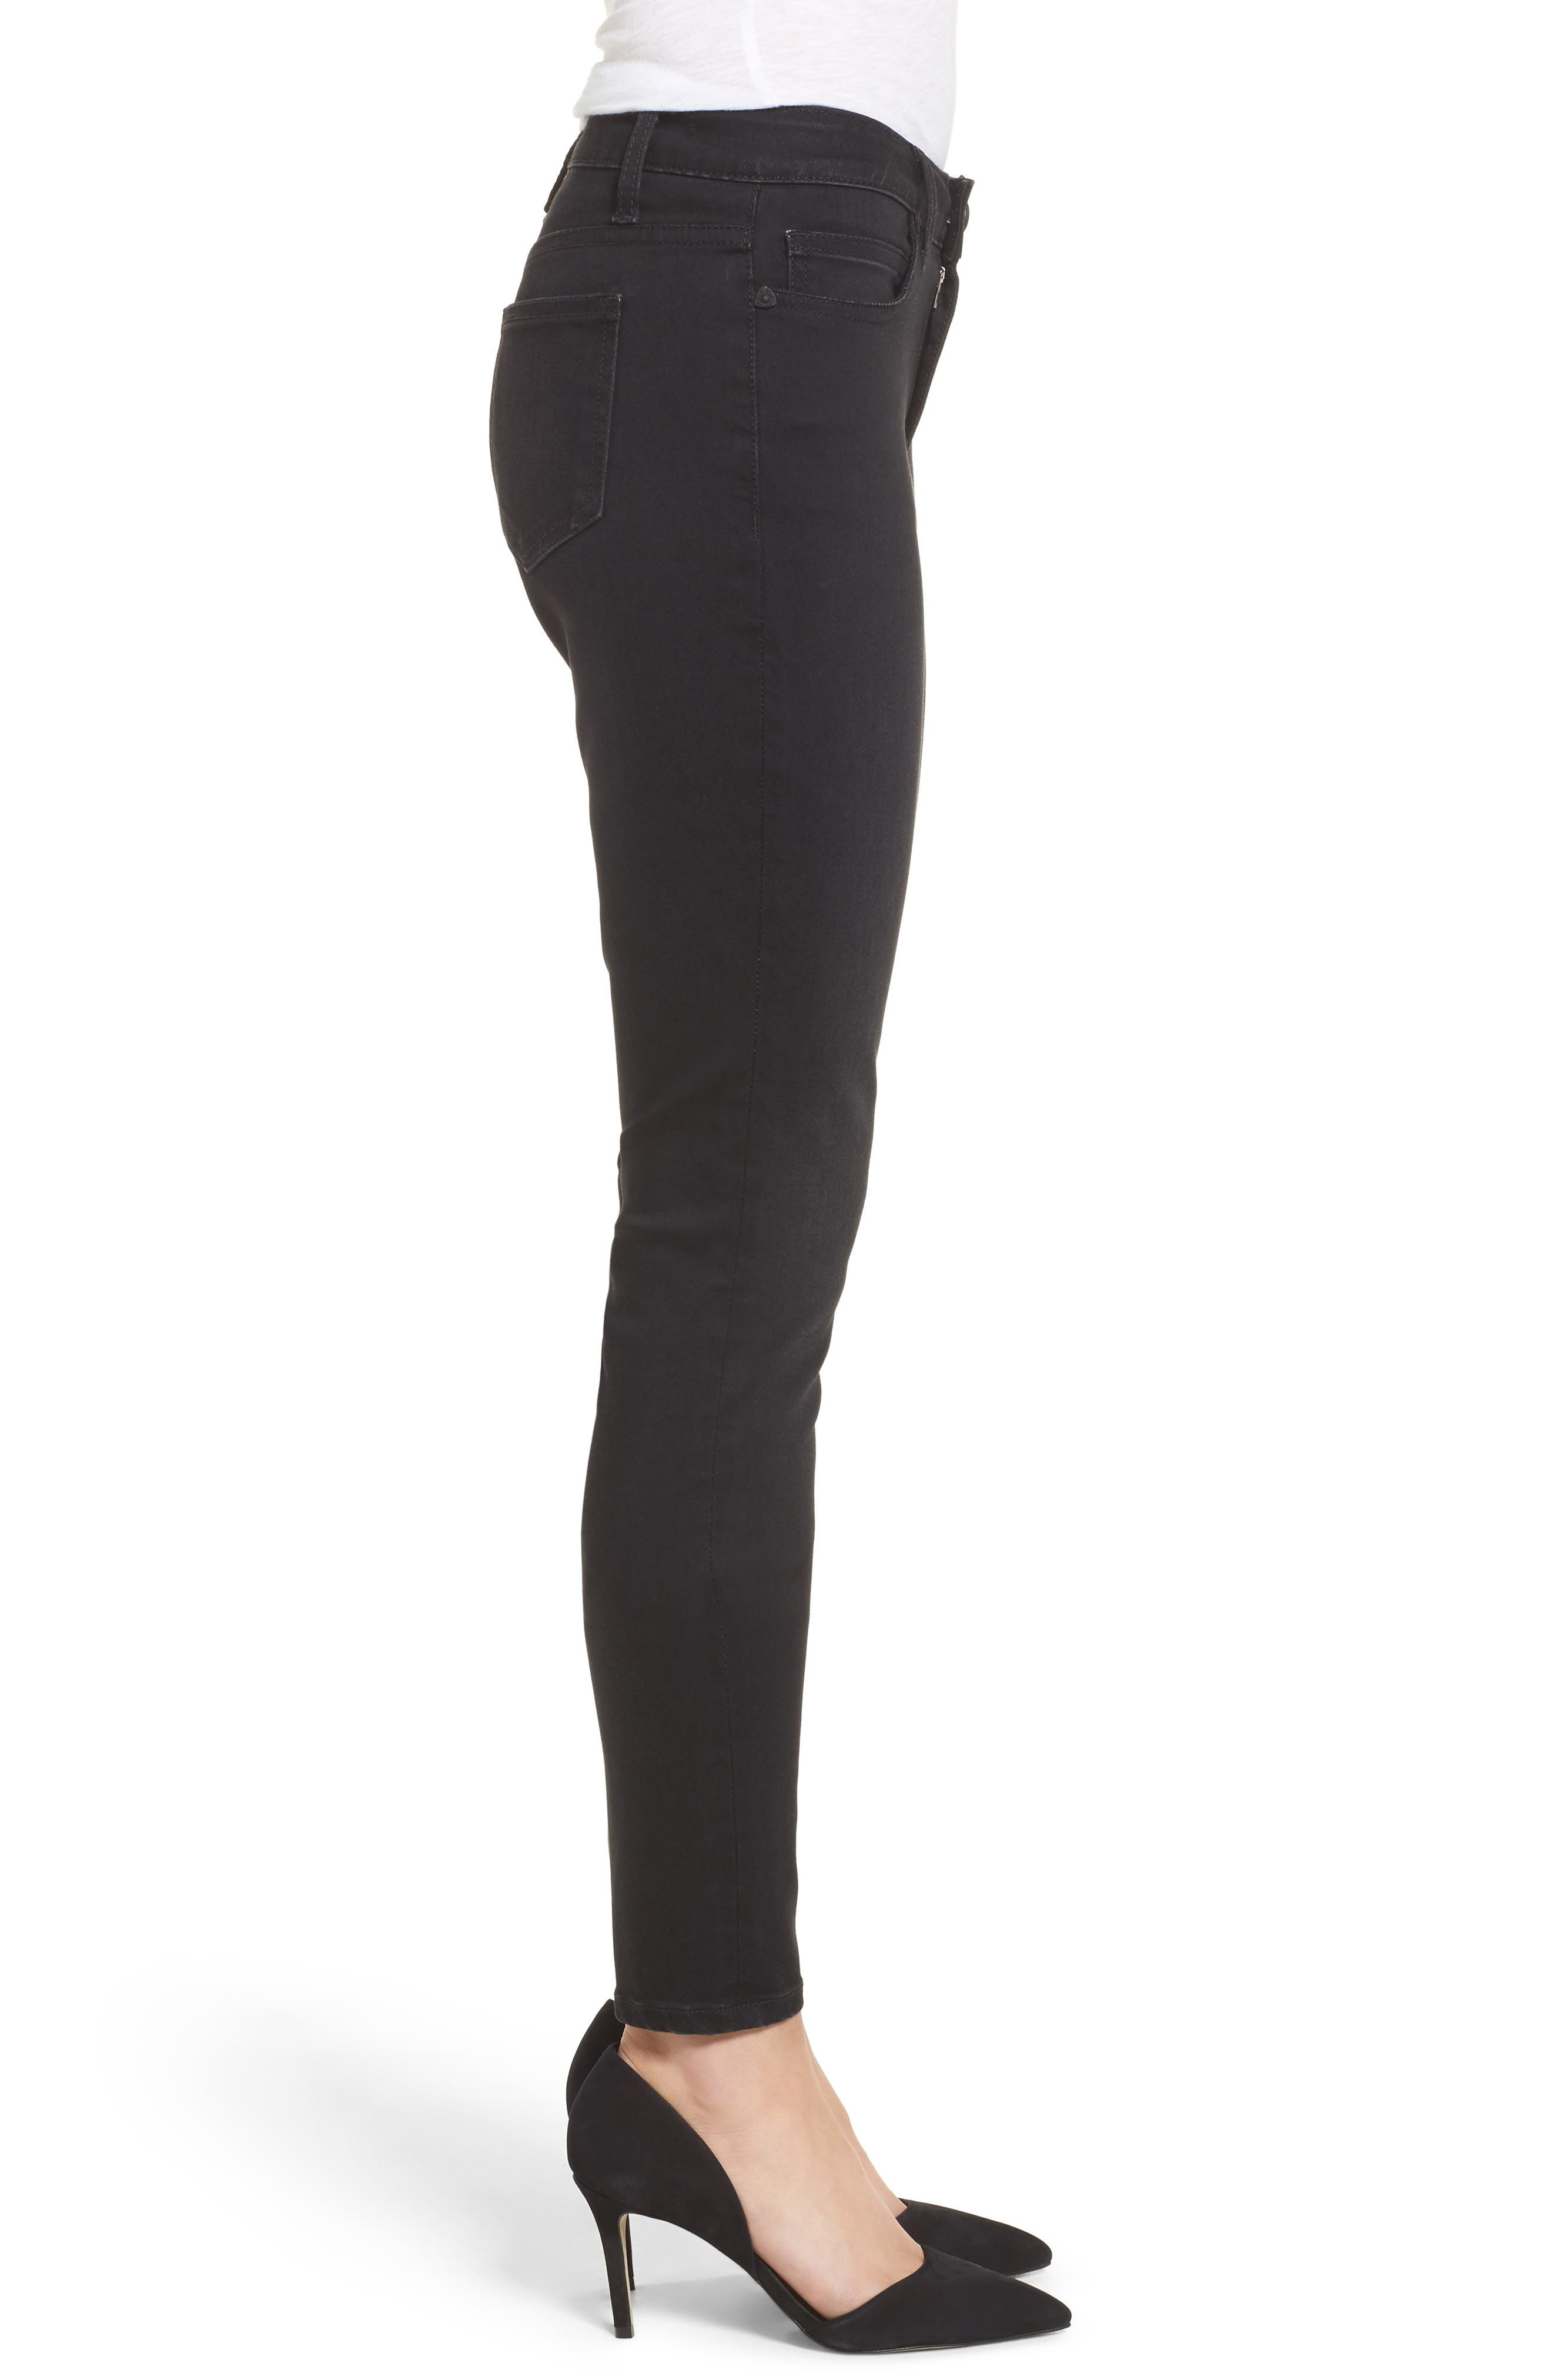 Alternate Image 3  - KUT from the Kloth Mia Curvy Fit Skinny Jeans (Regular & Petite)